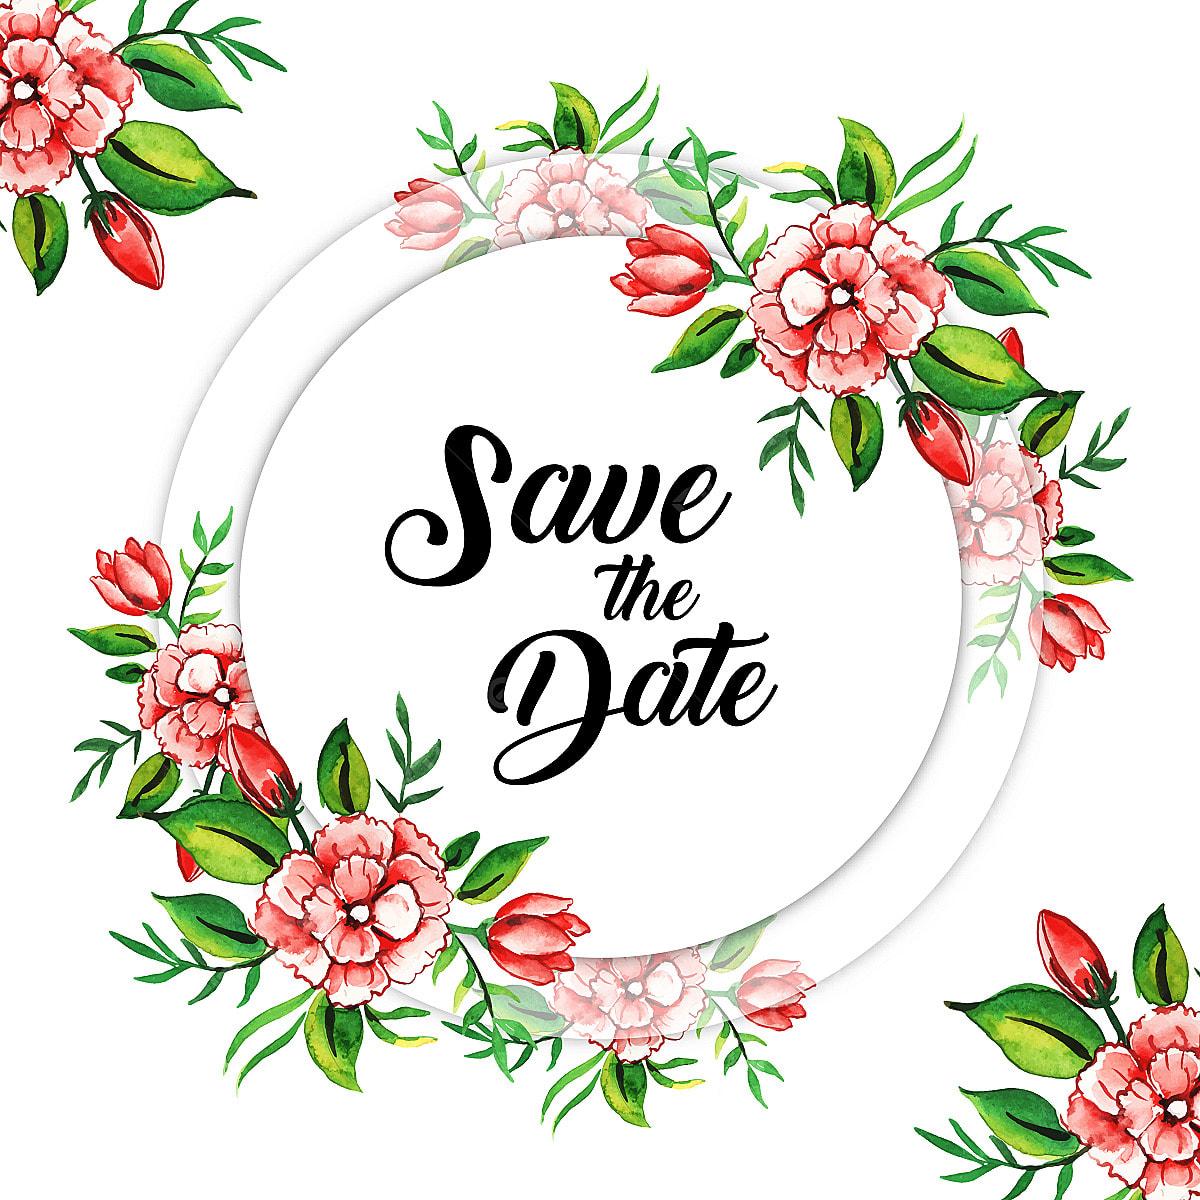 Undangan Pernikahan PNG Images   Vector and PSD Files   Free ...